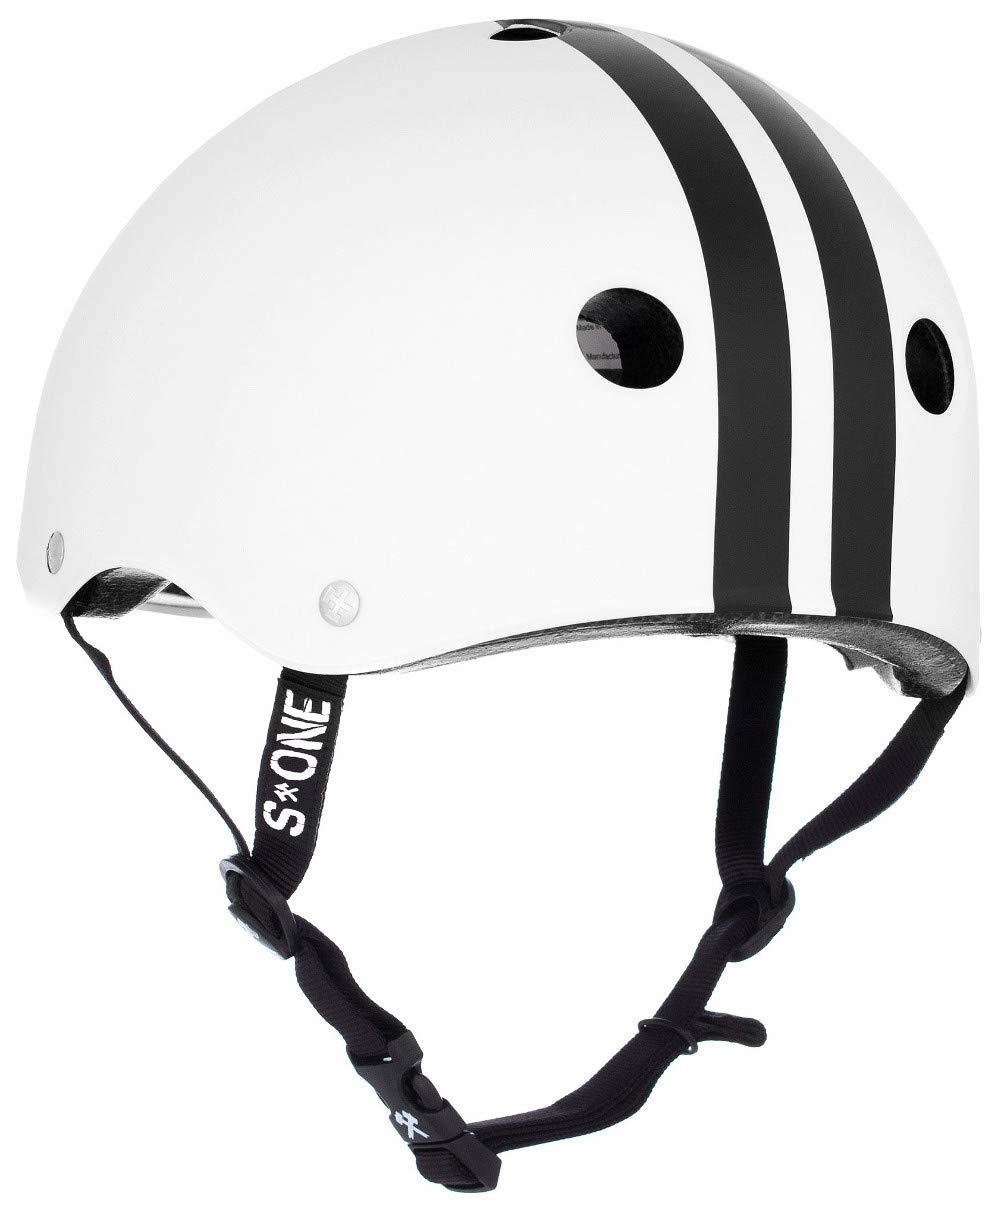 Lagoon Gloss Multi-Impact Helmet 21.5 Medium S-ONE Lifer CPSC